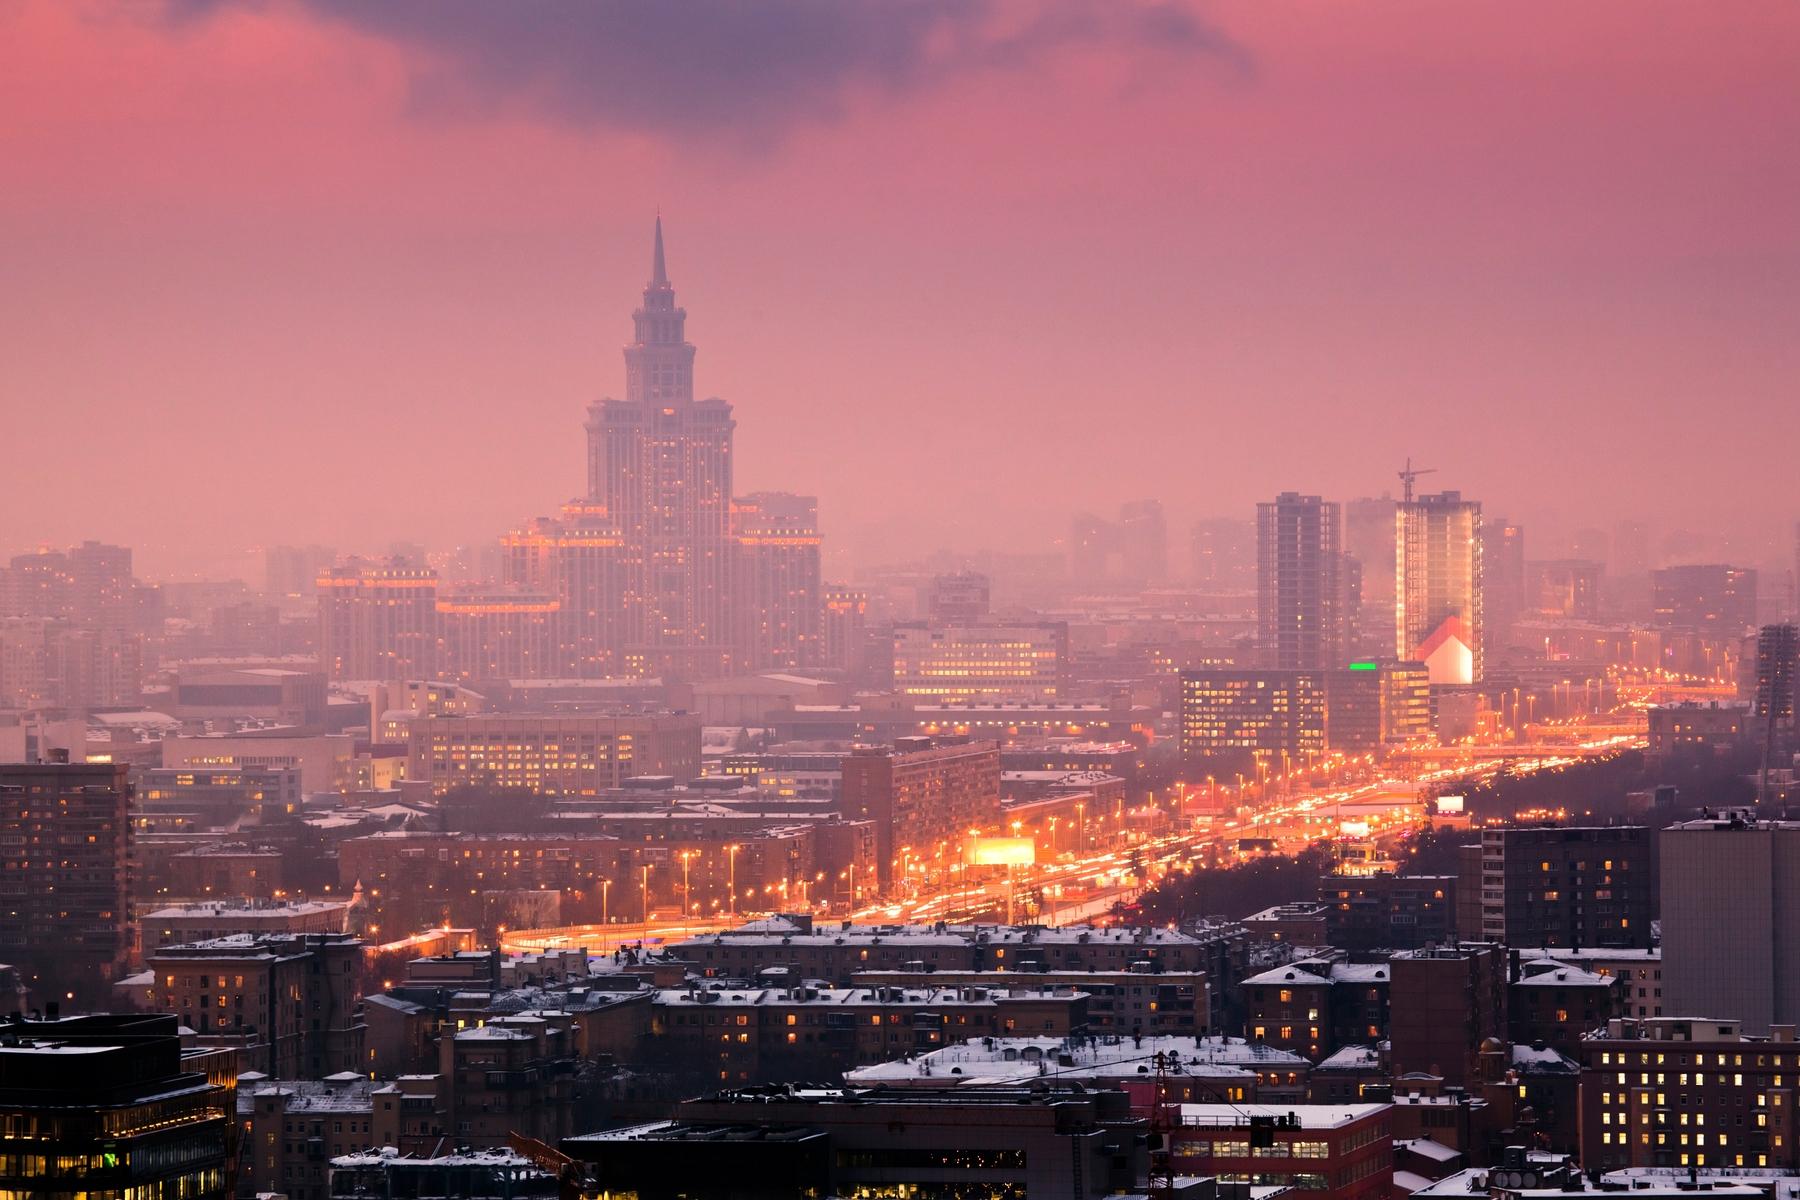 Панорама Москвы на закате с высоты. Коронавирус и путешествия